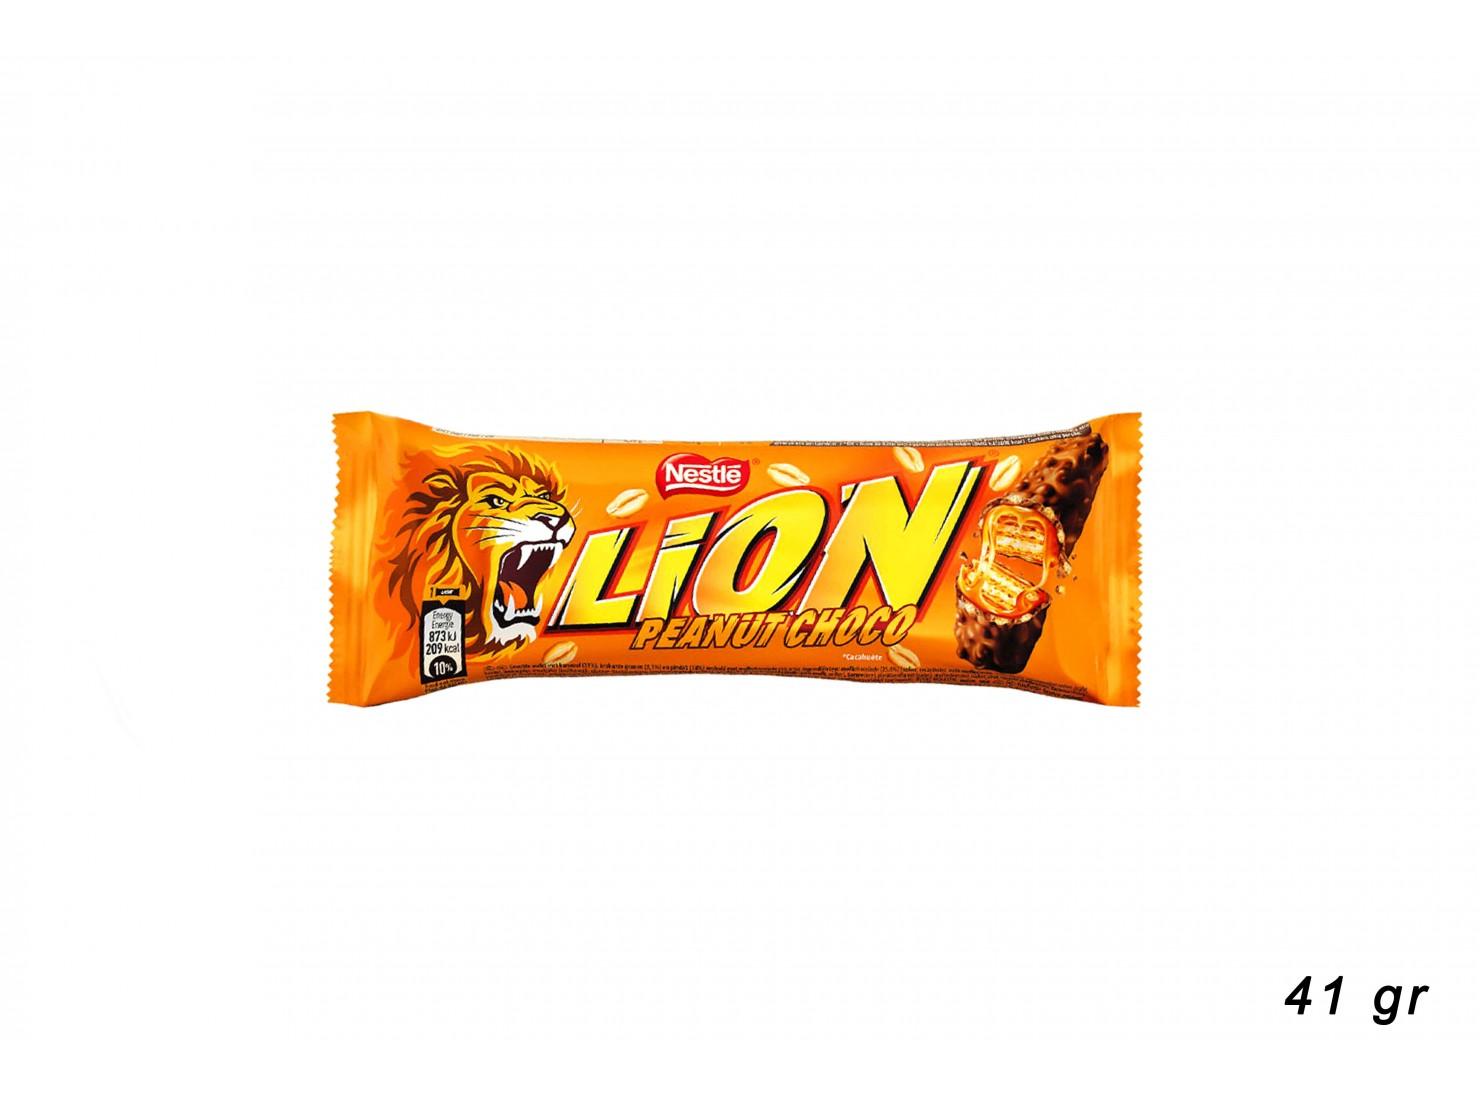 NESTLE LION PEANUT CHOCO 41GR